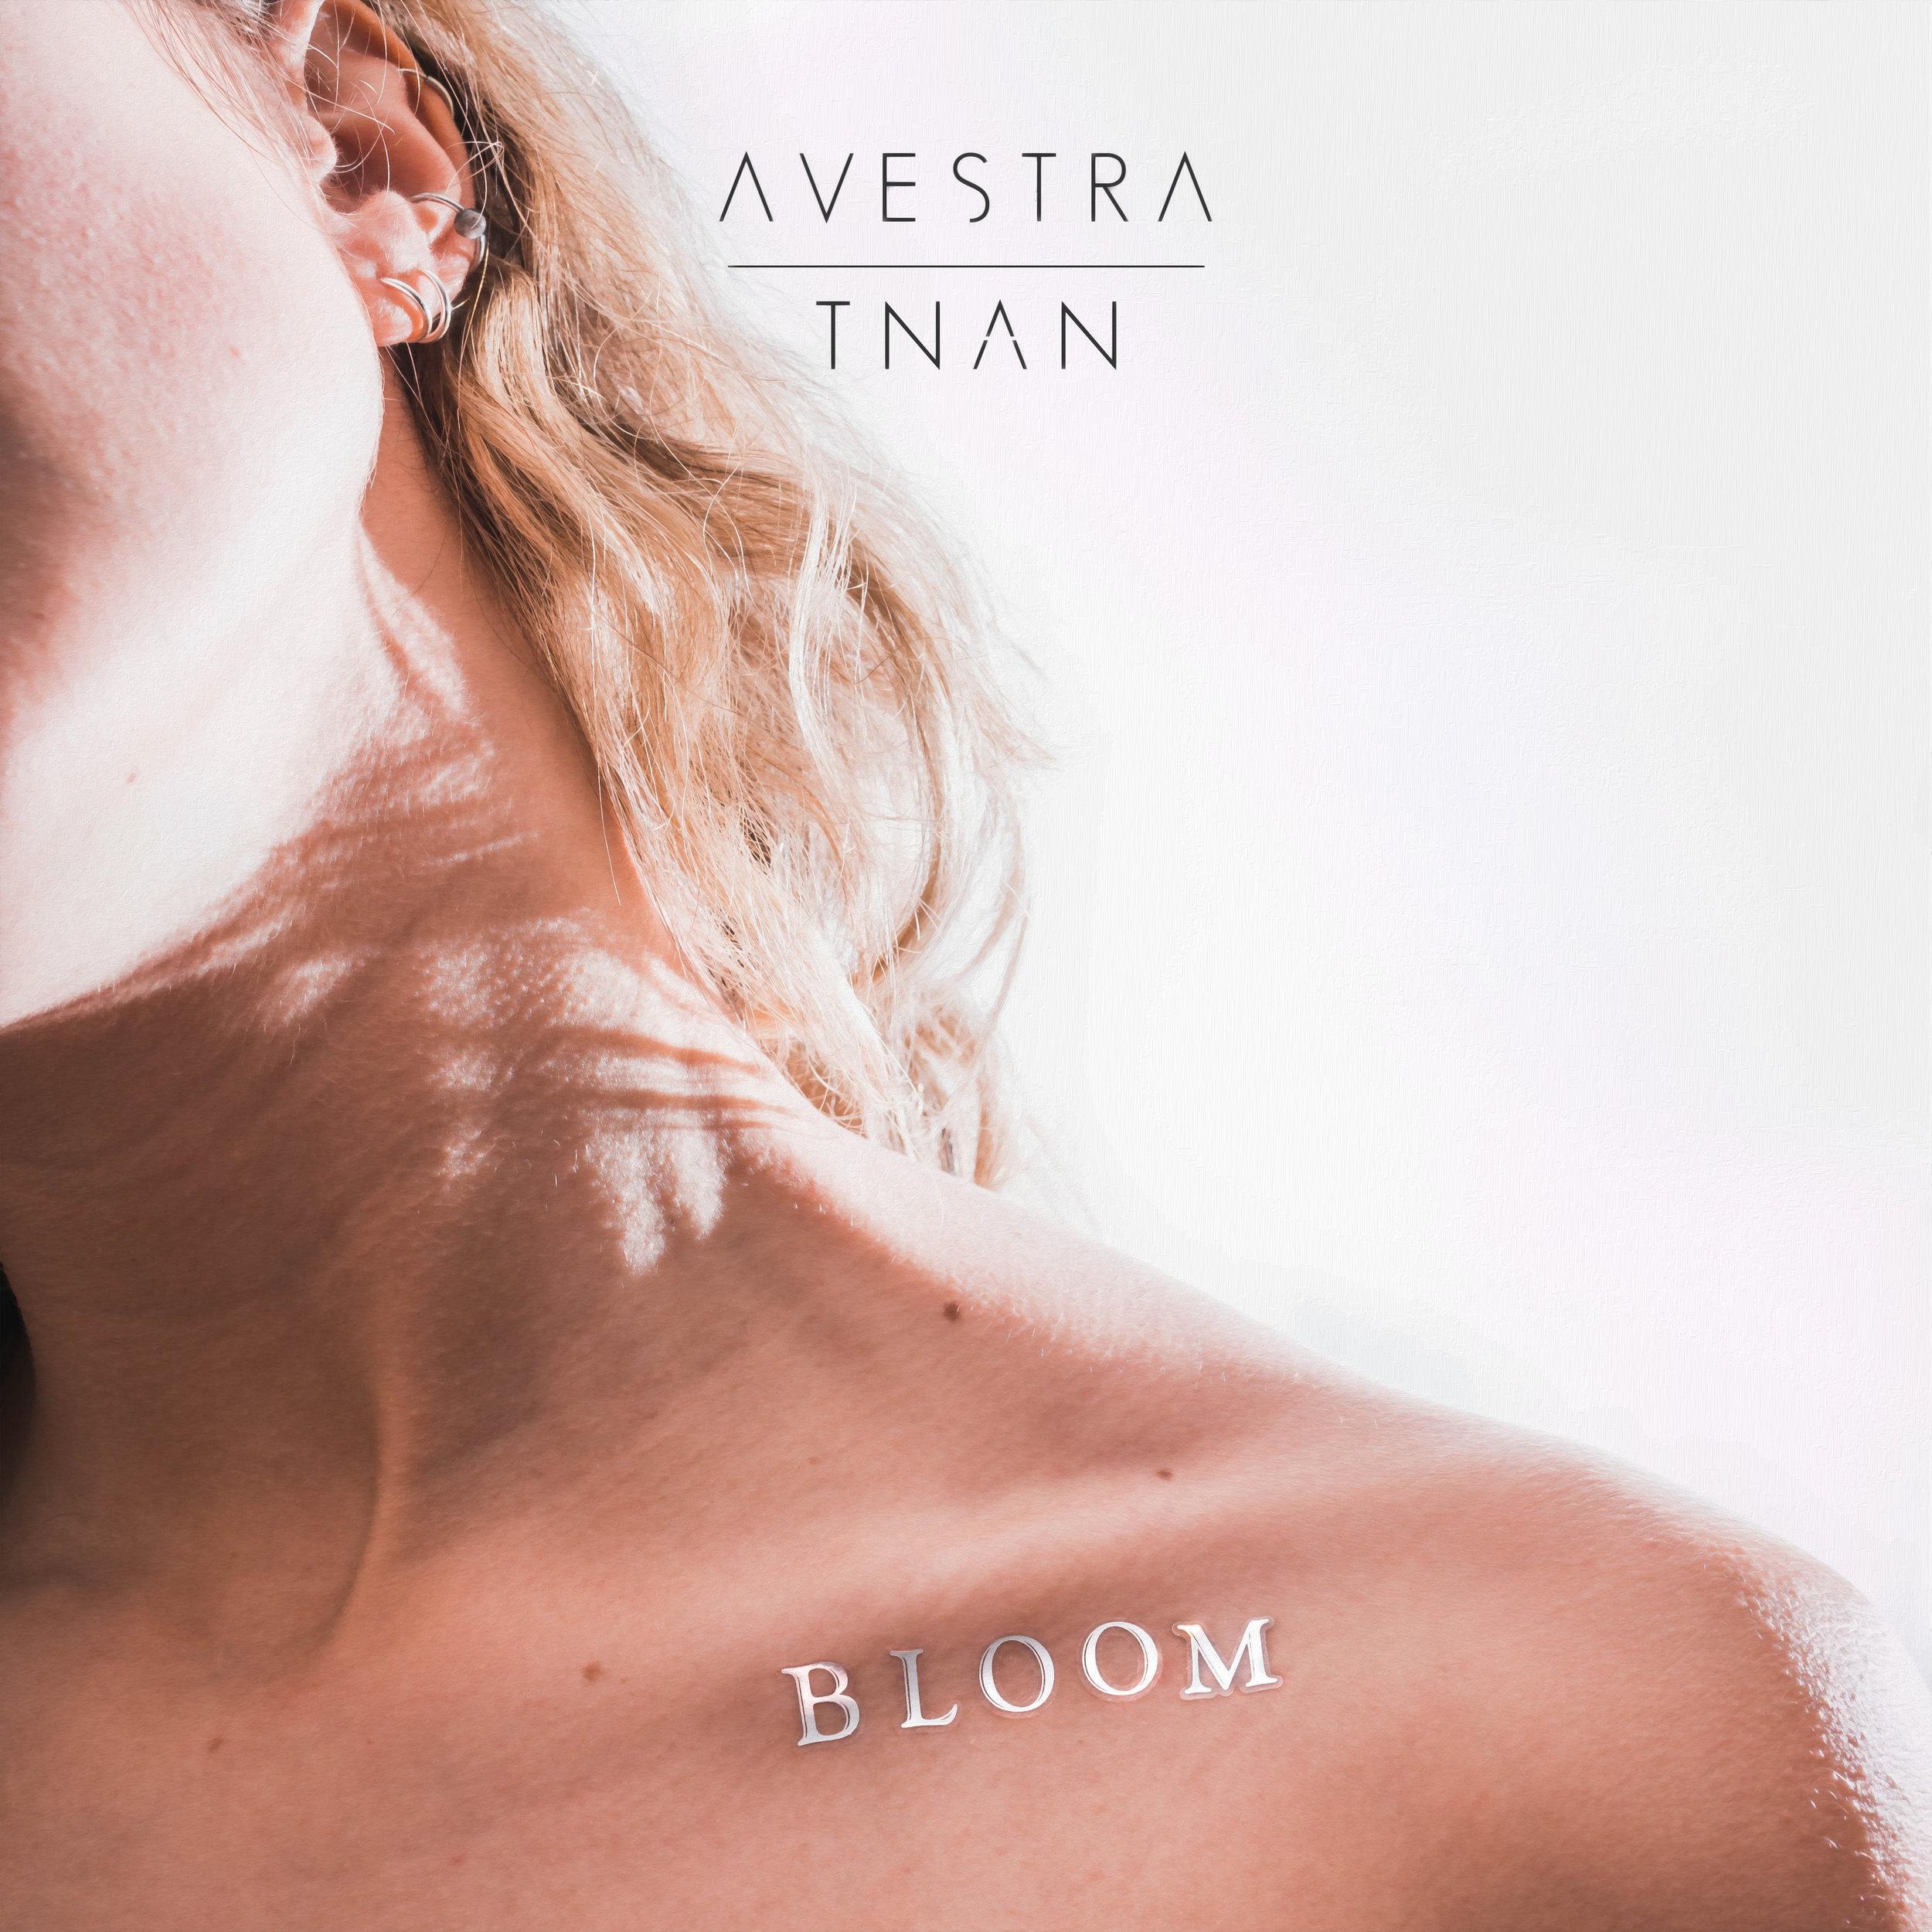 TNAN x AVESTRA - Bloom EP.jpg